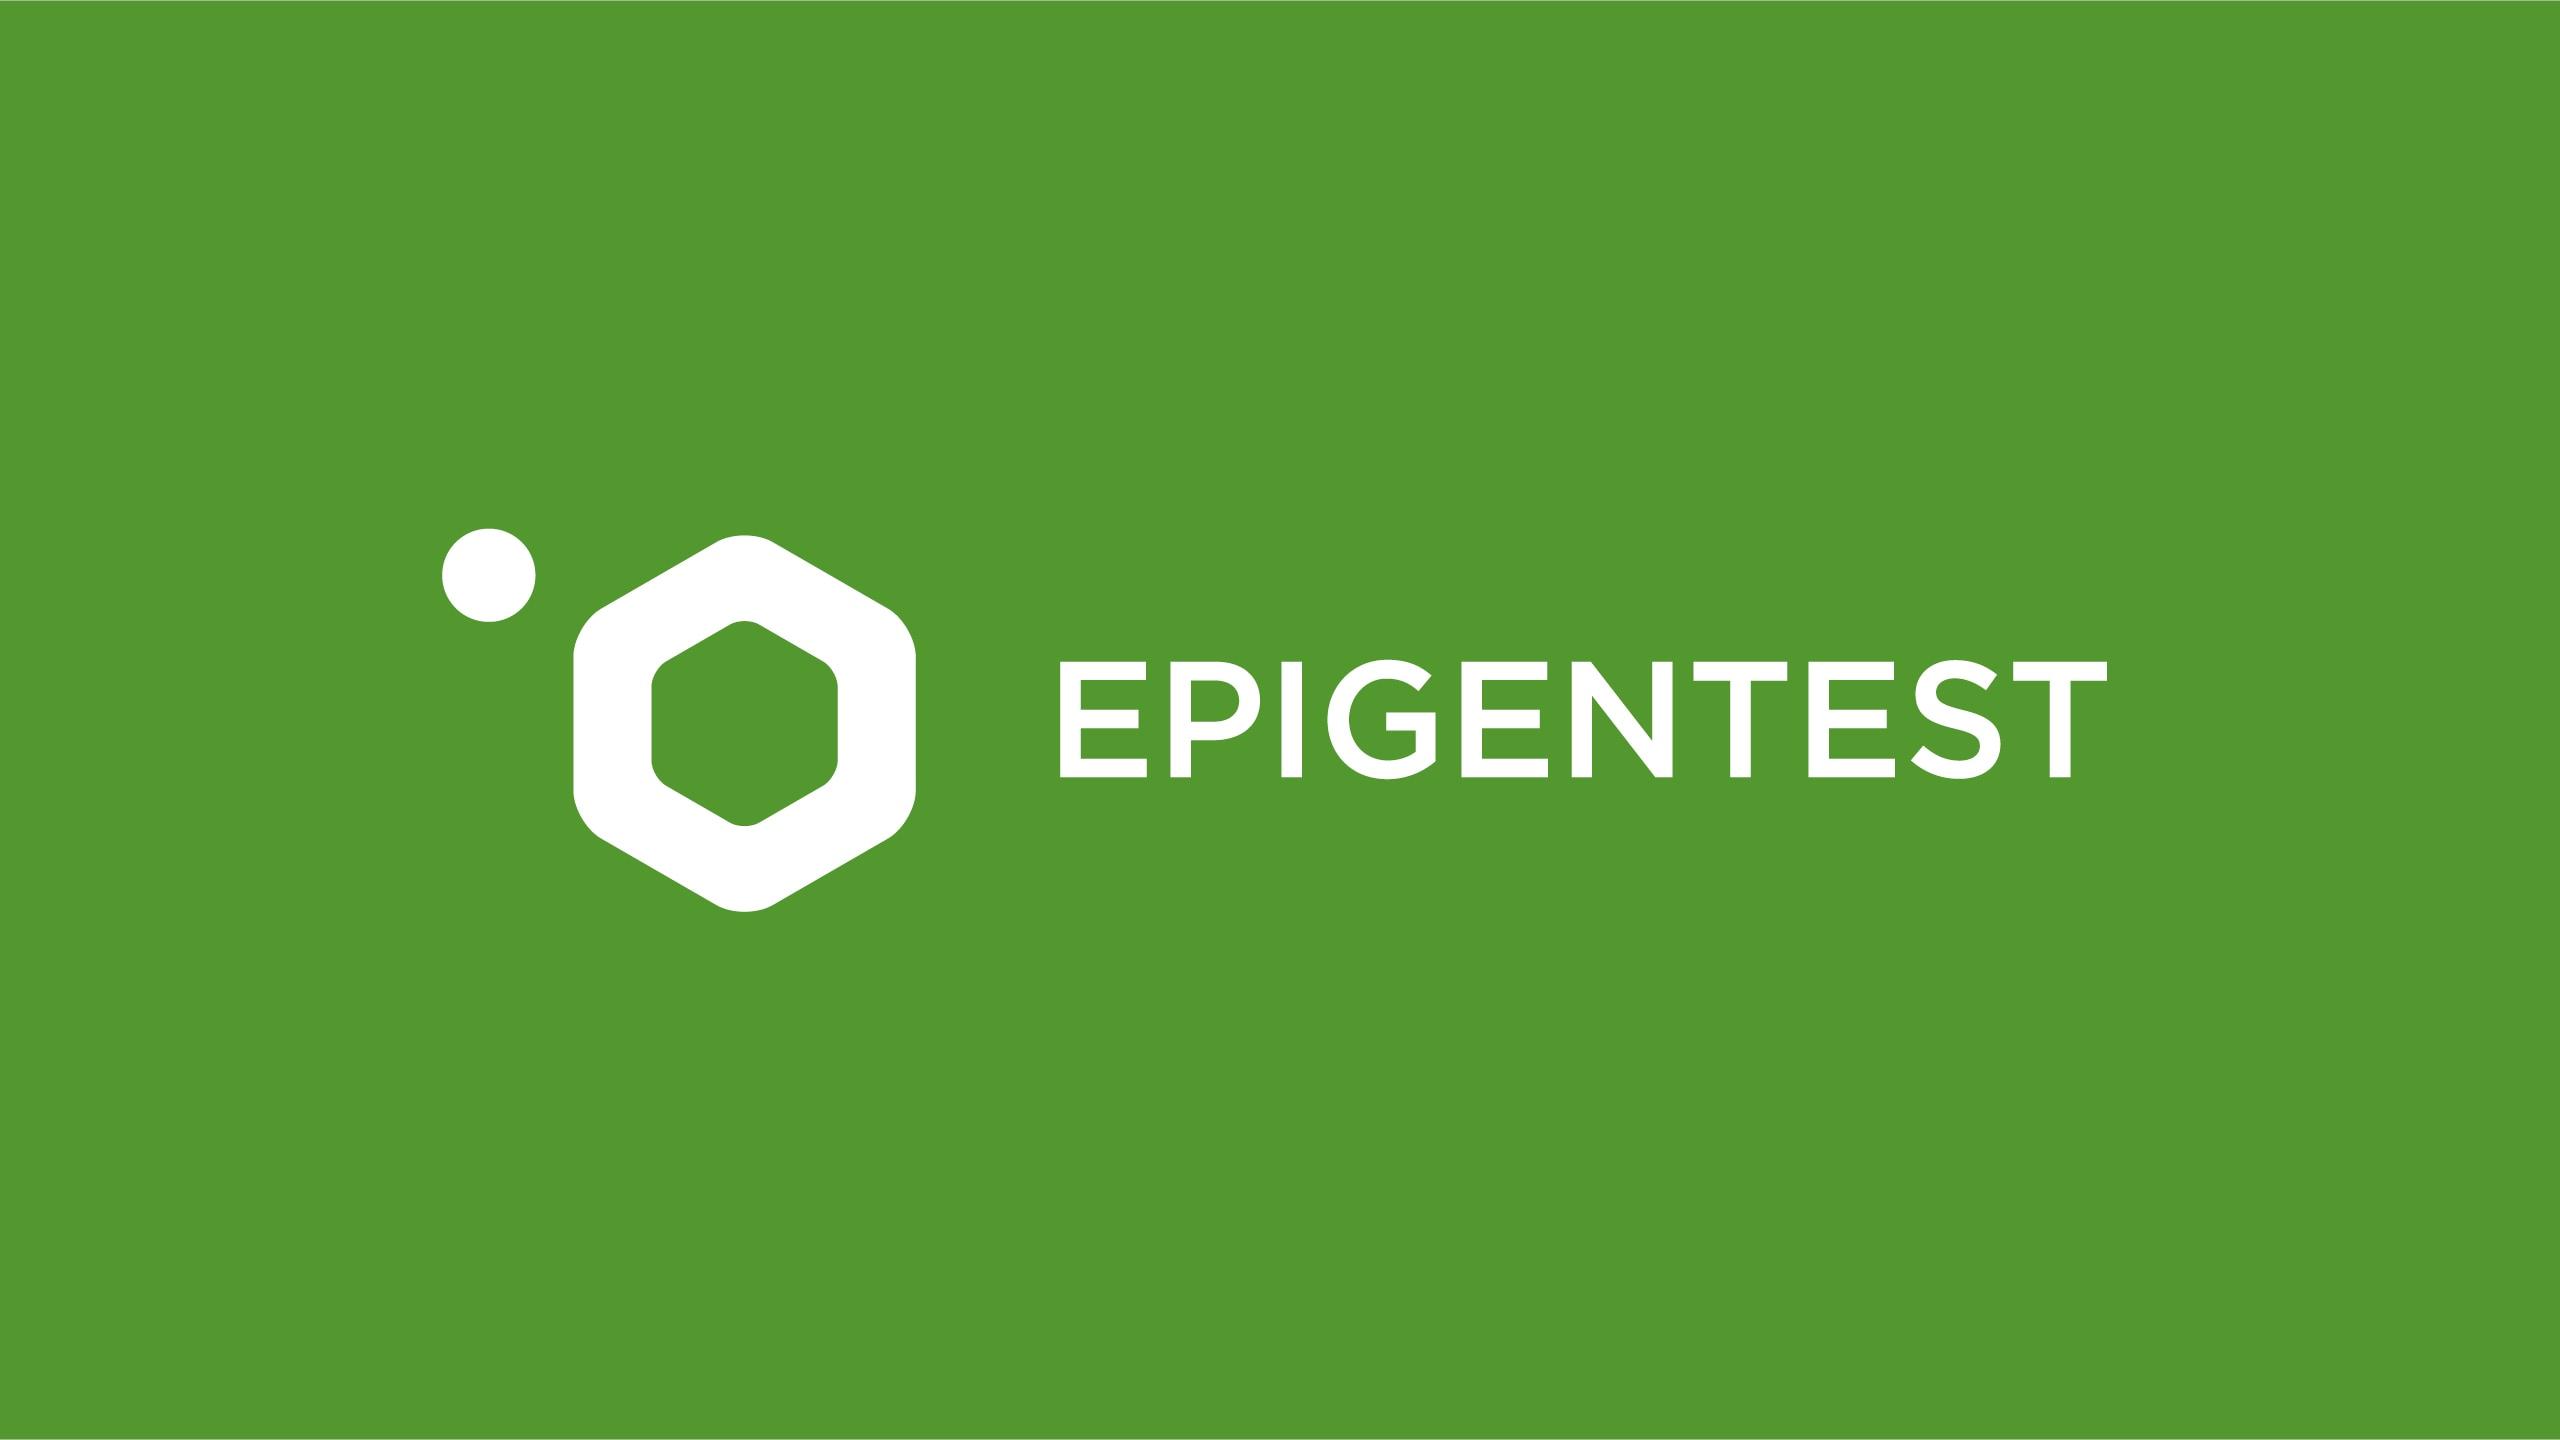 Epigentest_2_02